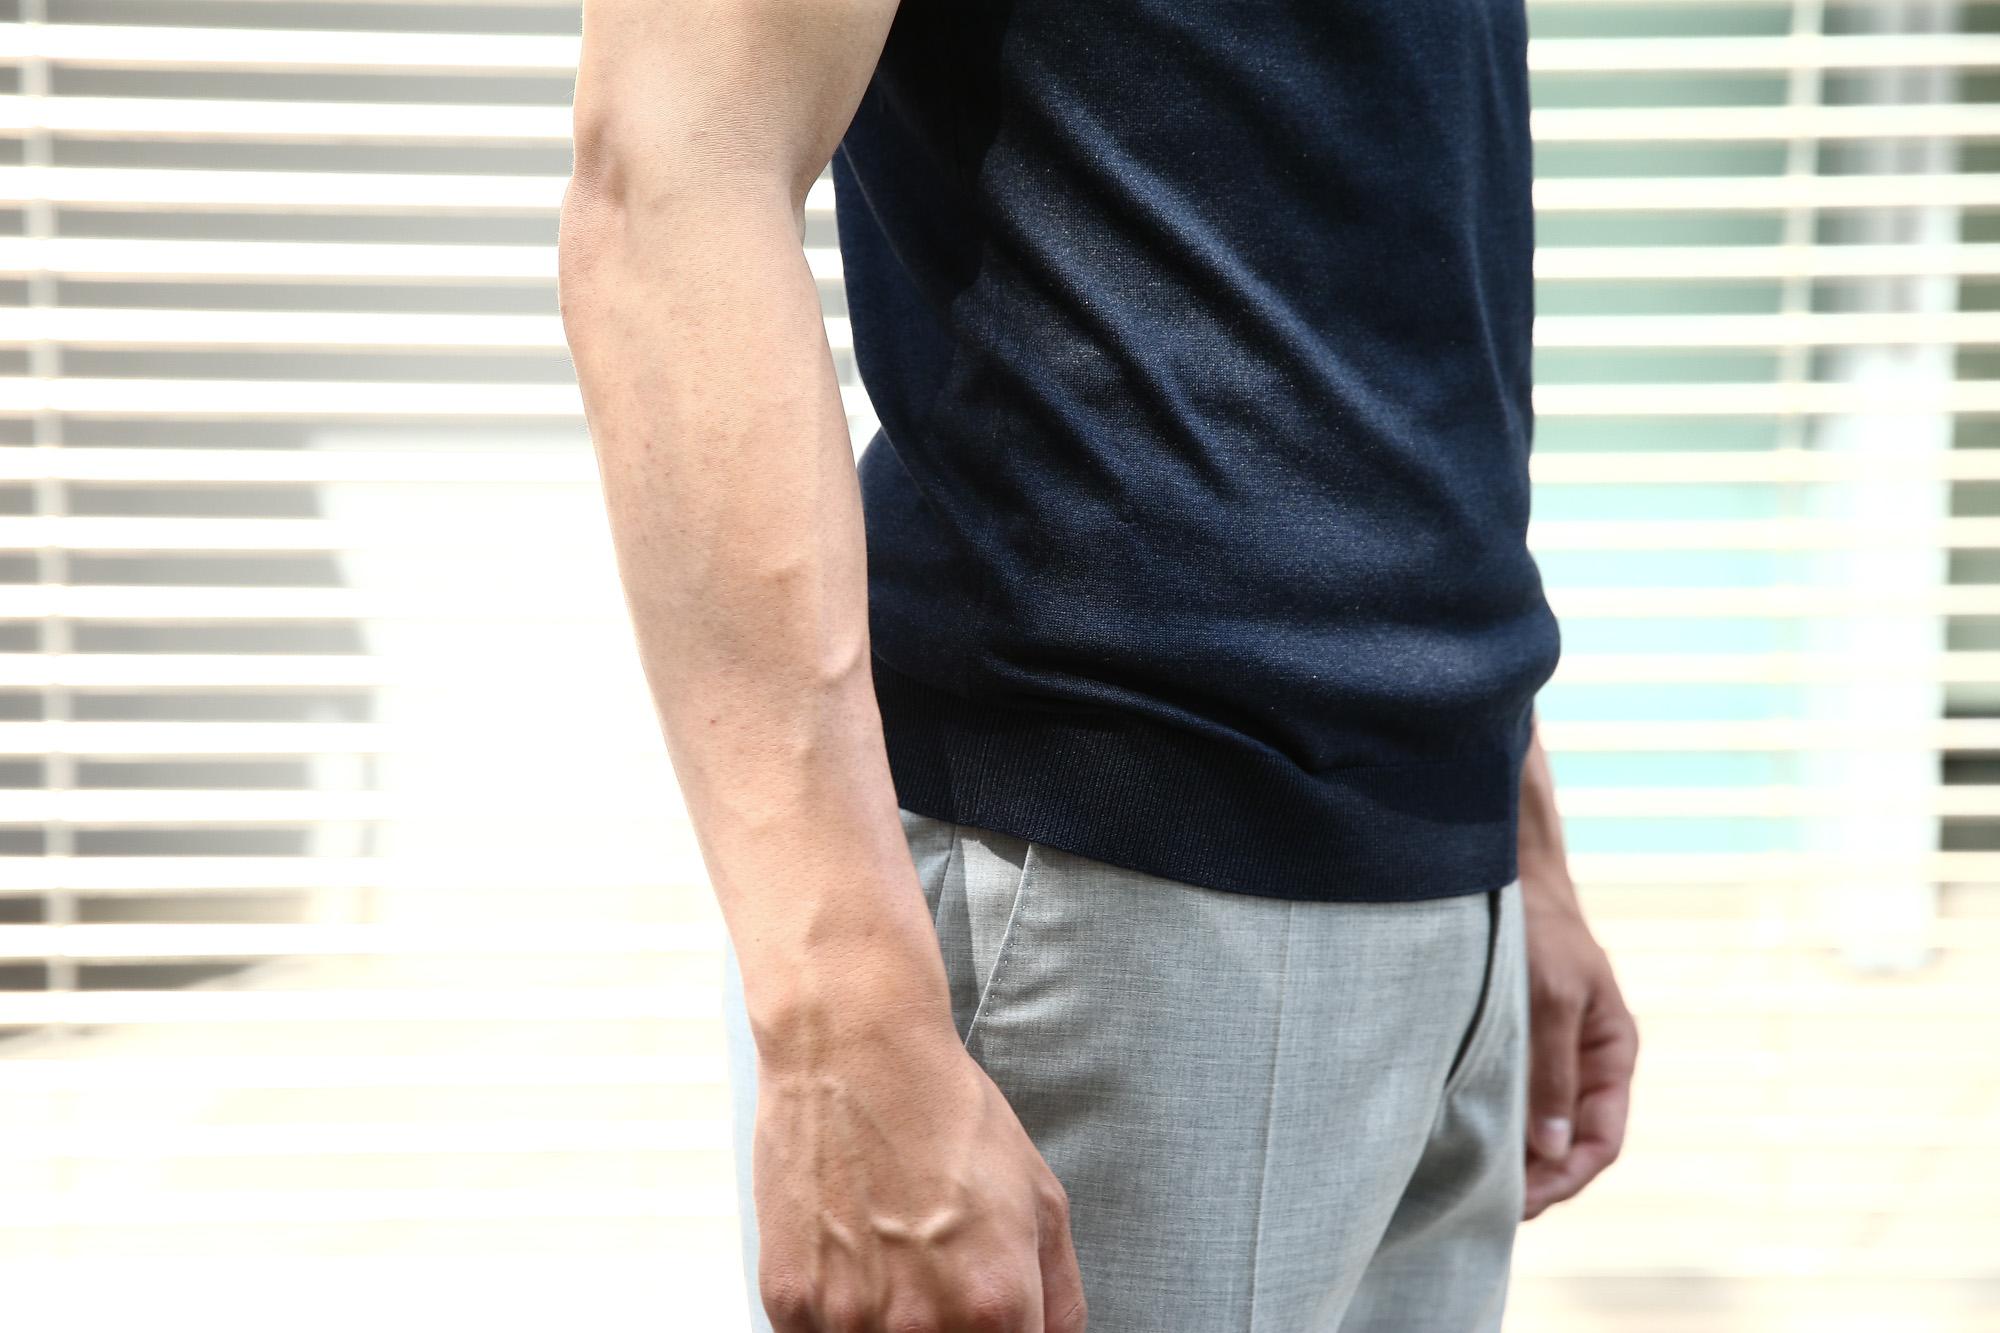 Gran Sasso (グランサッソ) Silk Knit T-shirt (シルクニット Tシャツ) SETA (シルク 100%) ショートスリーブ シルク ニット Tシャツ NAVY (ネイビー・597) made in italy (イタリア製) 2018 春夏新作 gransasso グランサッソ 愛知 名古屋 Alto e Diritto アルト エ デリット 44,46,48,50,52,54